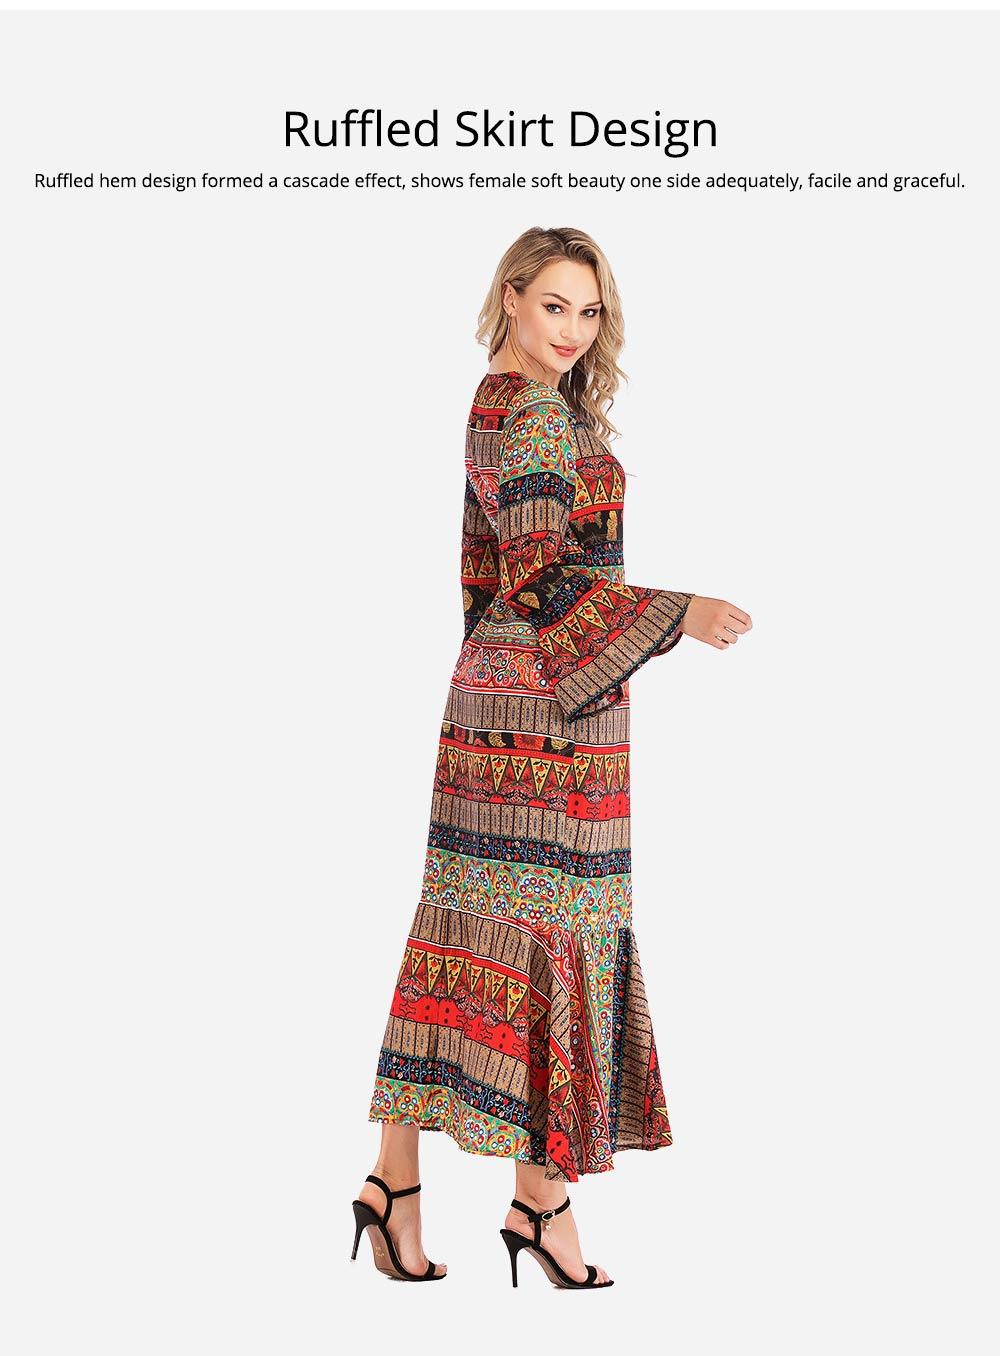 Flared Sleeve Beach Dress for Women, Women V-neck Chiffon Dress Ruffle Hem 2